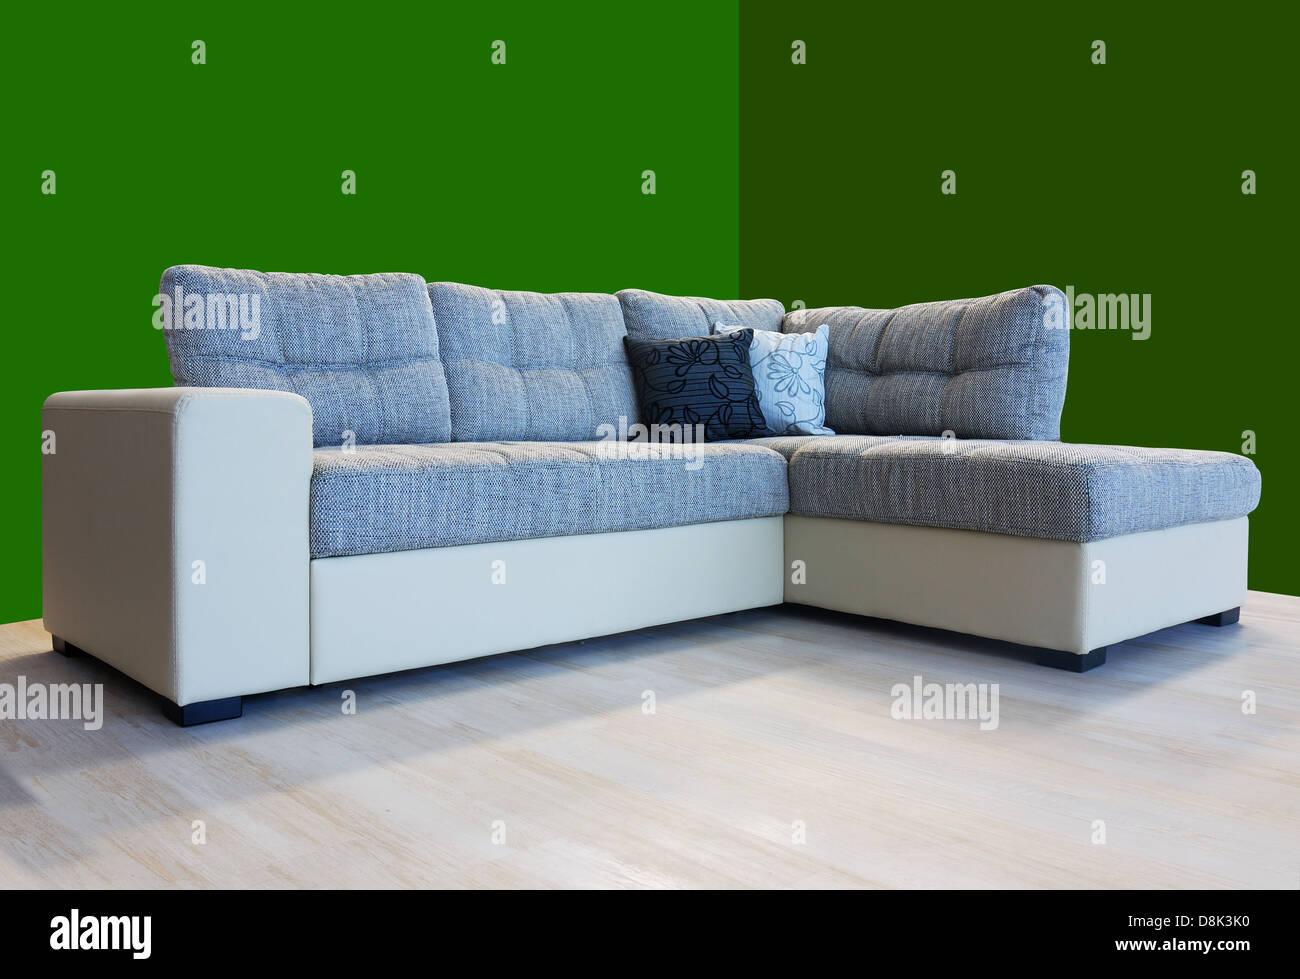 L shape fabric four sitter sofa, grey color - Stock Image